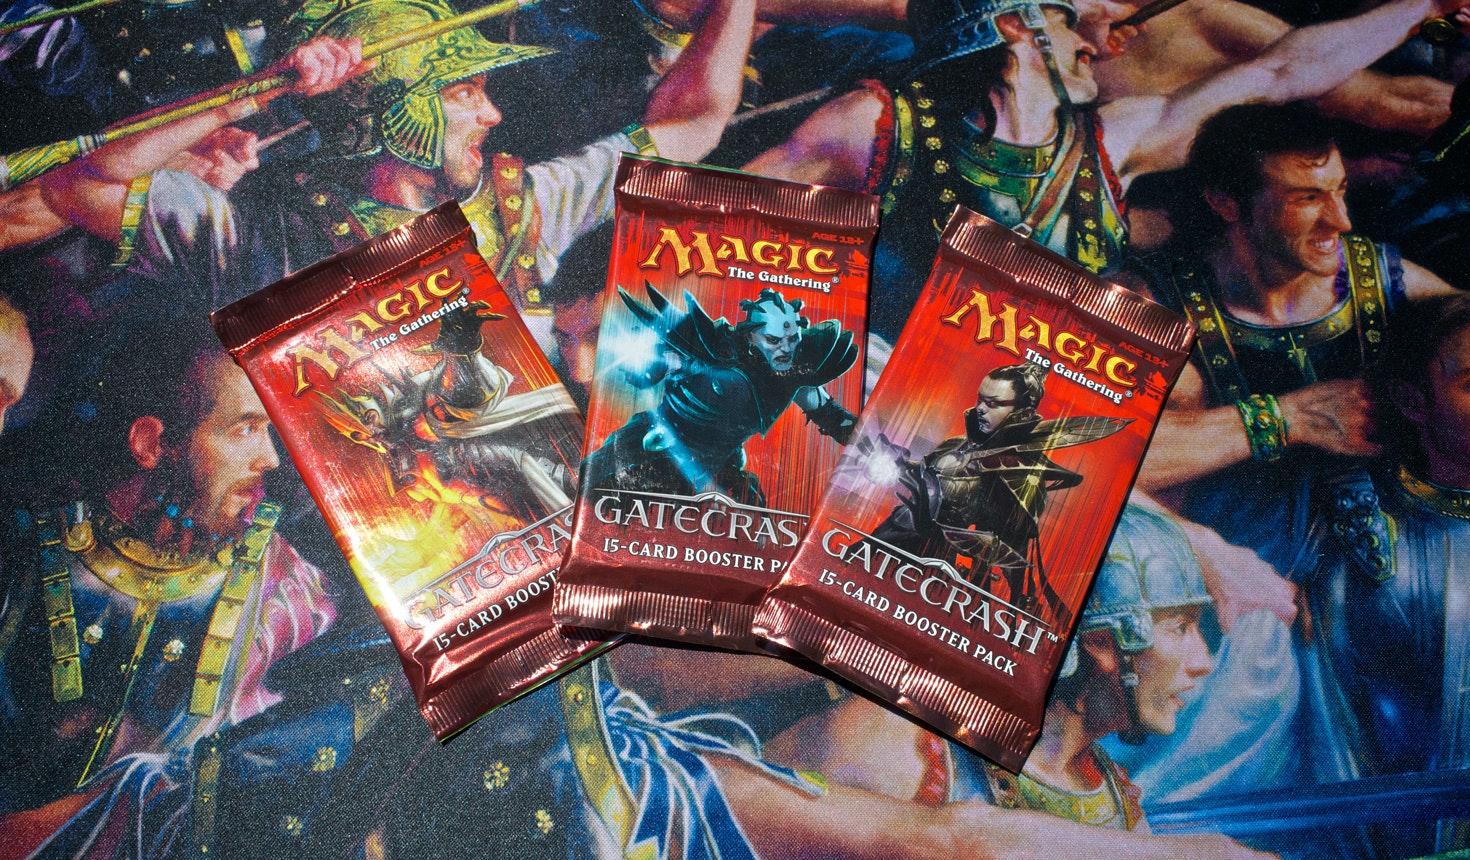 Gatecrash Boosters (3-Pack)